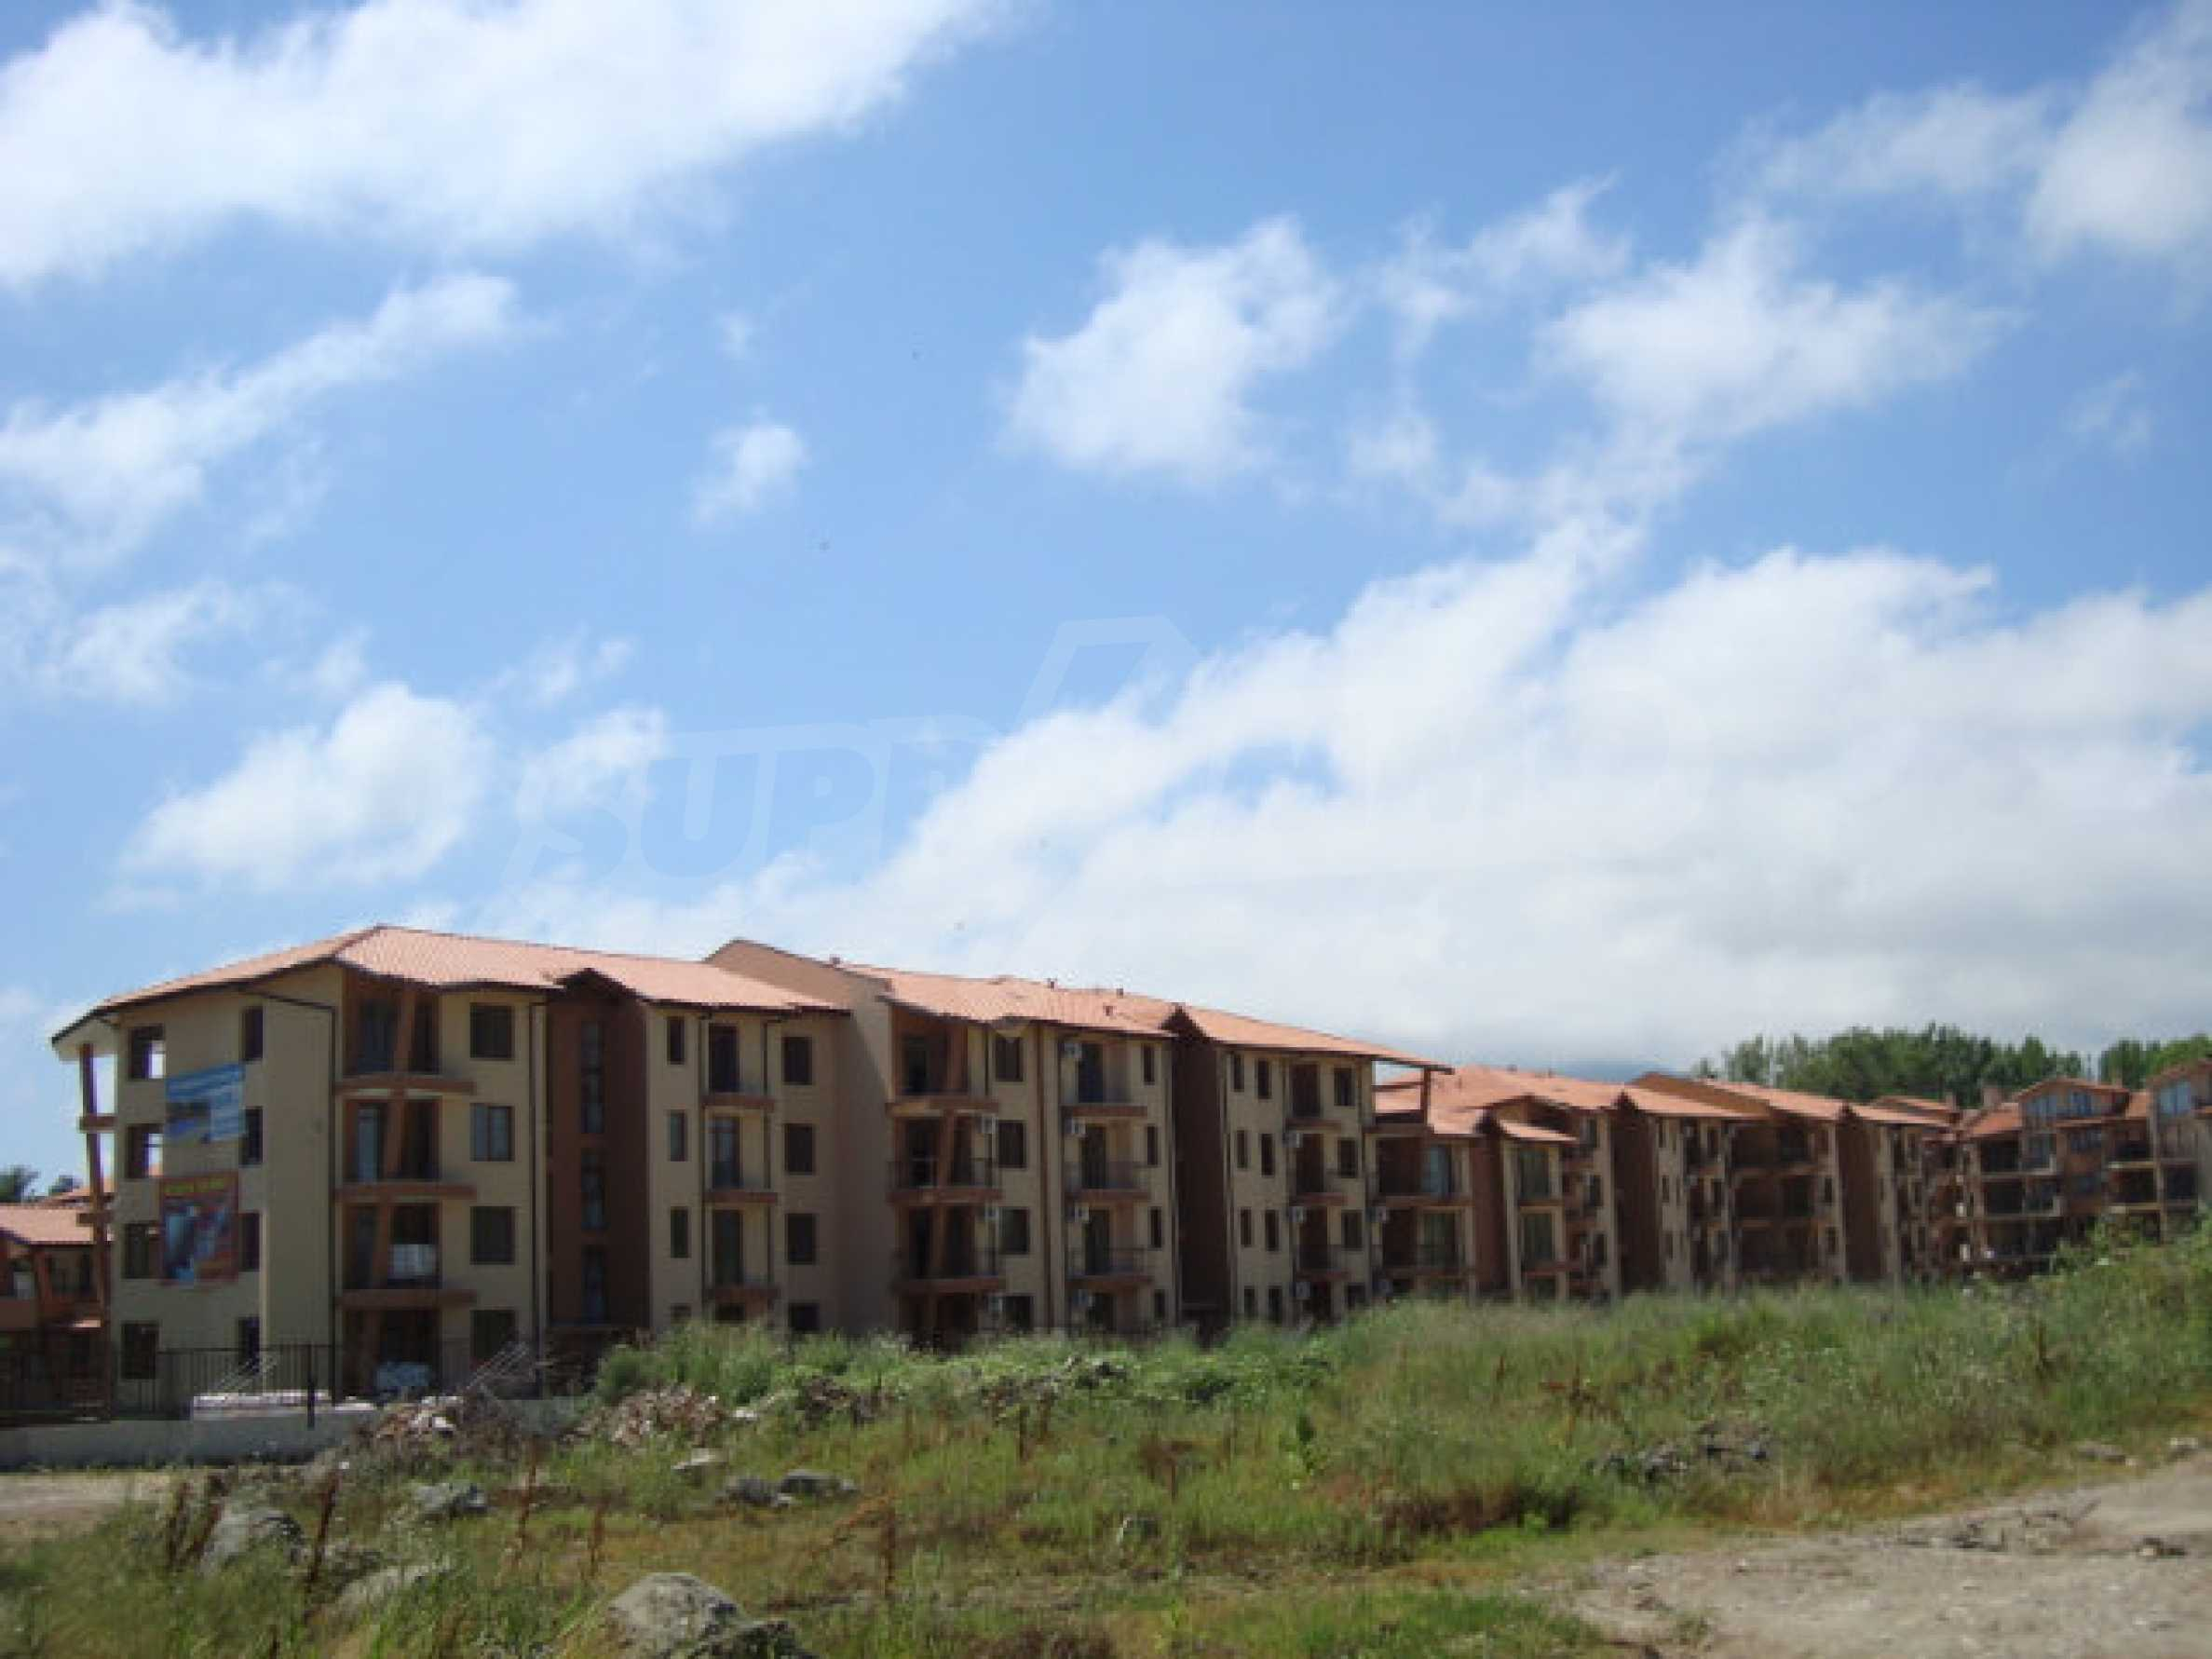 Studios und Apartments im Nestinarka-Komplex in Tsarevo 21